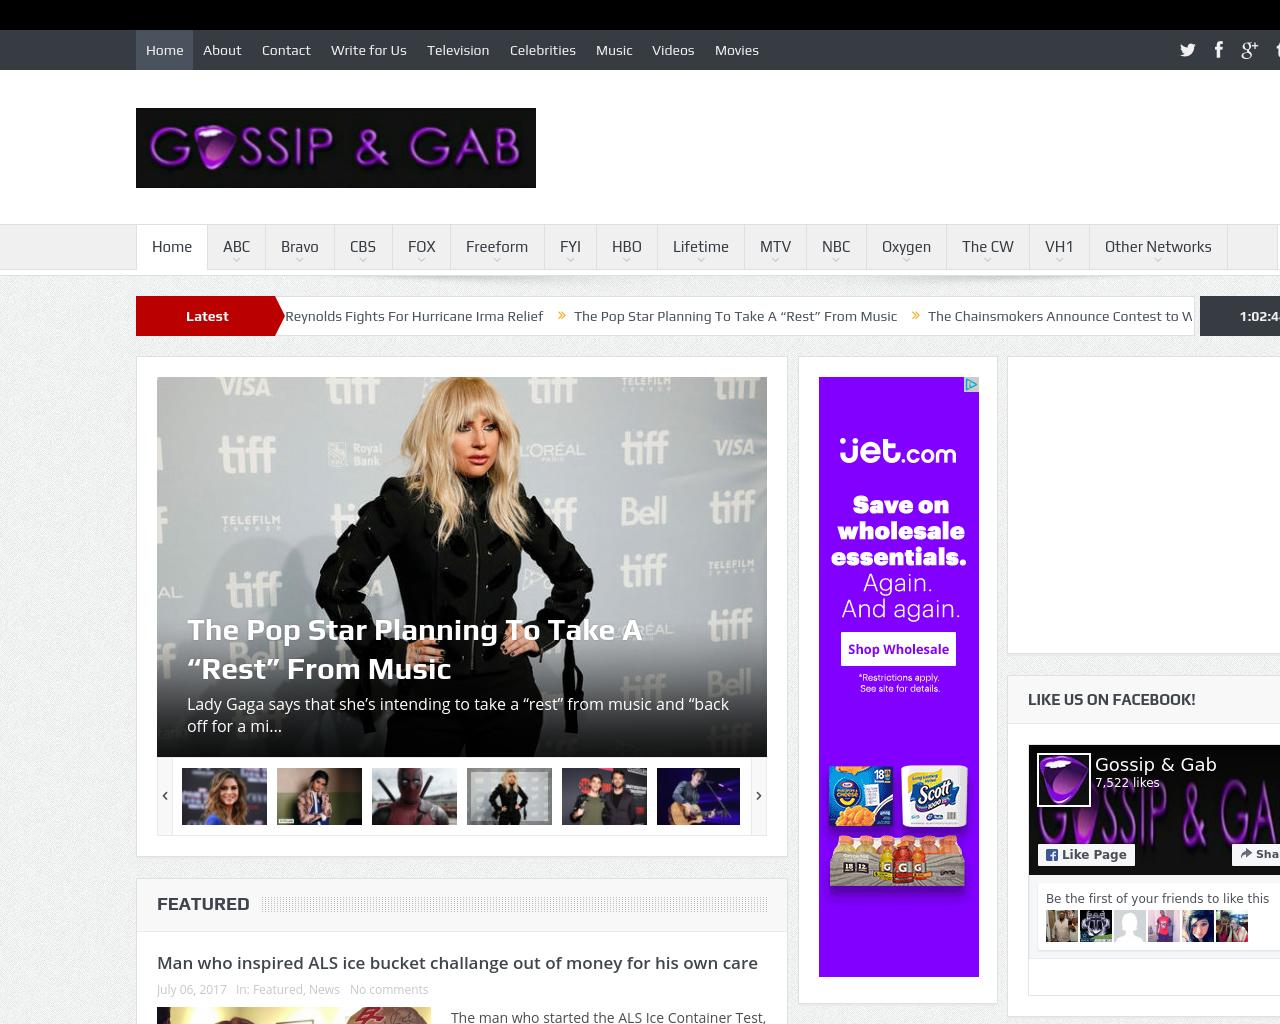 Gossip-&-Gab-Advertising-Reviews-Pricing